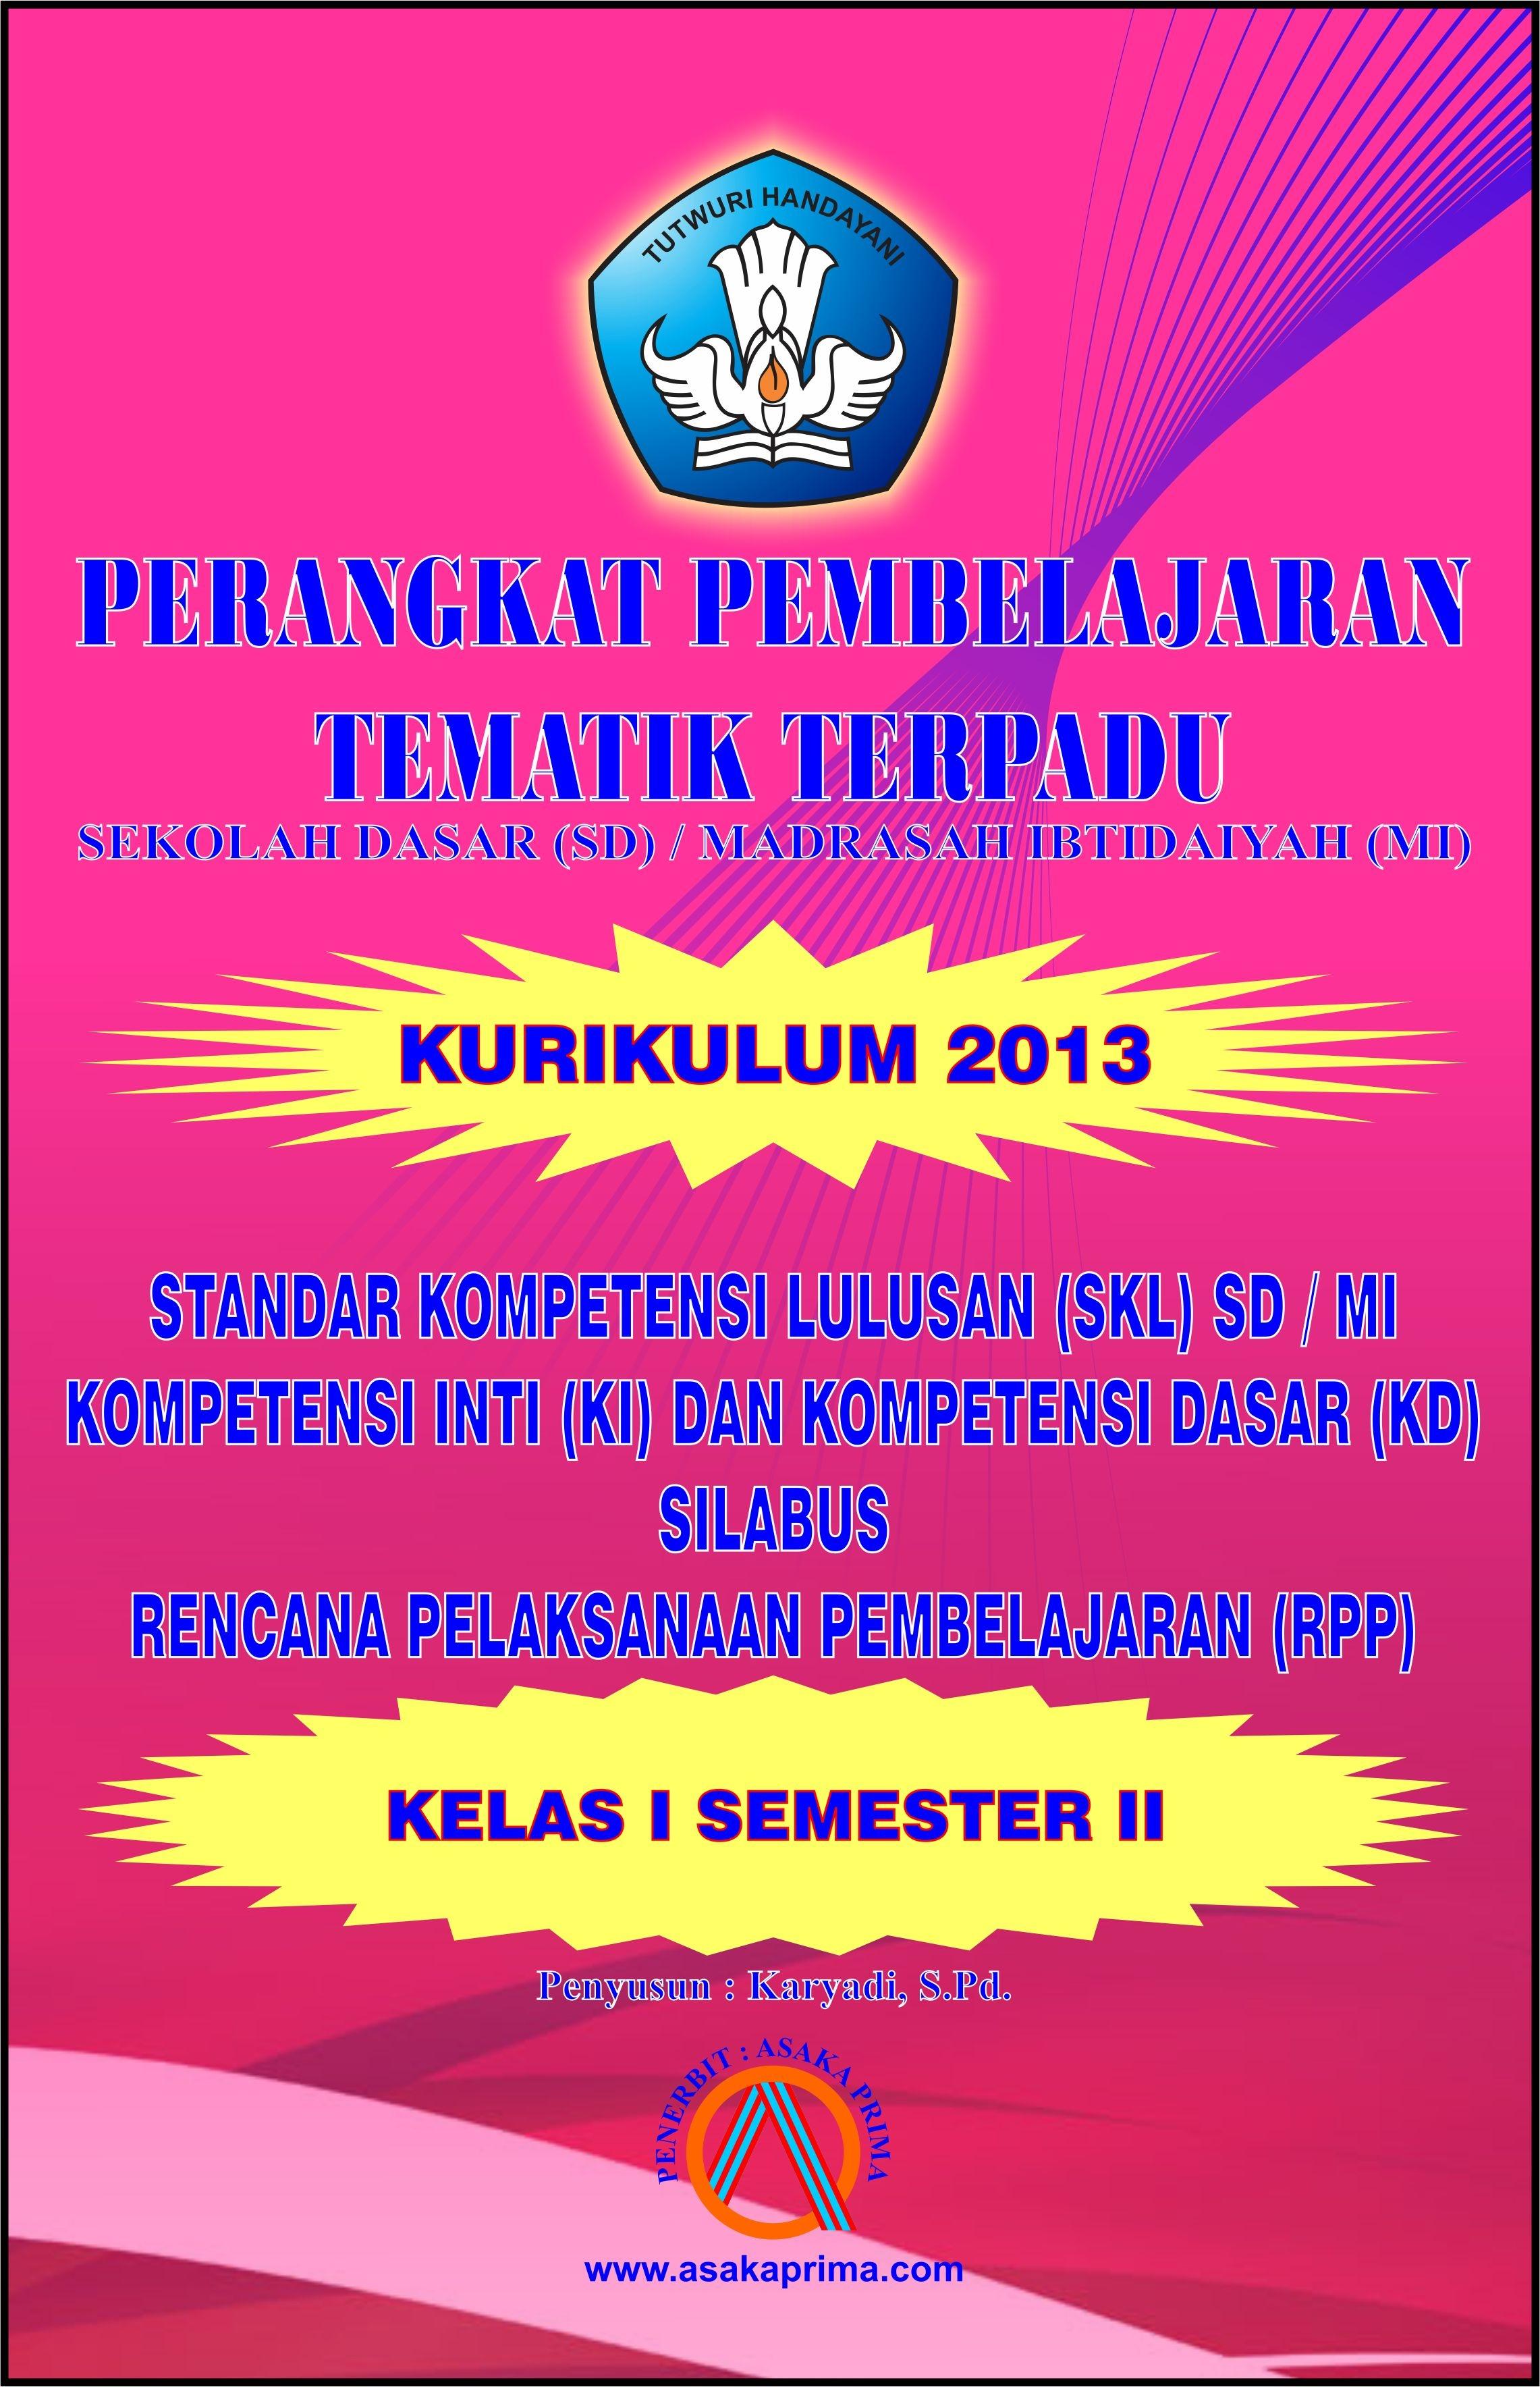 Buku Perangkat Pembelajaran Tematik Terpadu Rpp Sulabus Kurikulum 2013 Sd Asaka Prima Duta